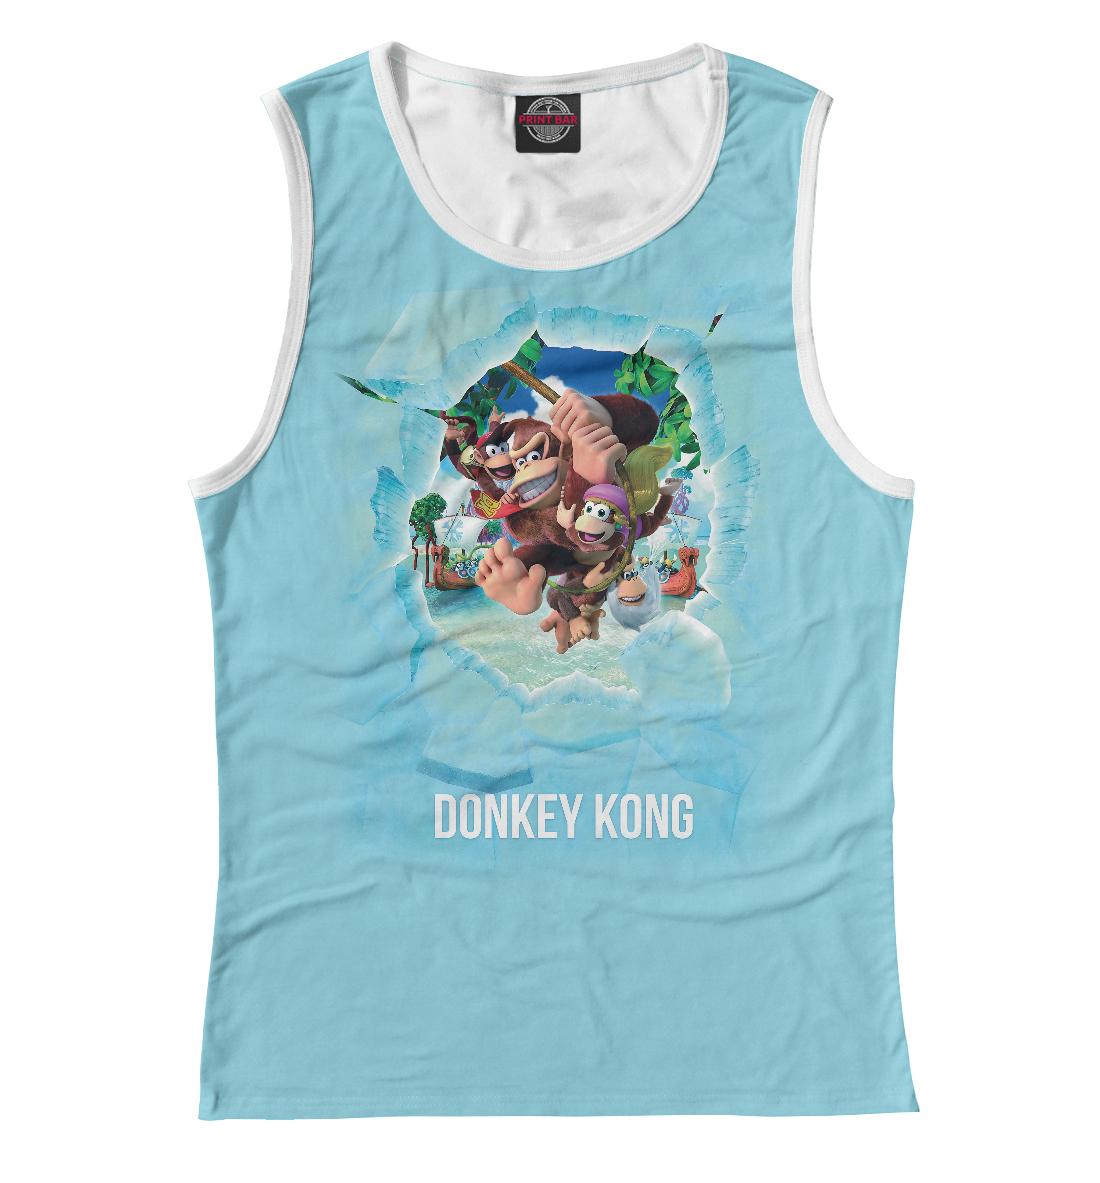 Купить Donkey Kong, Printbar, Майки, RPG-786965-may-1